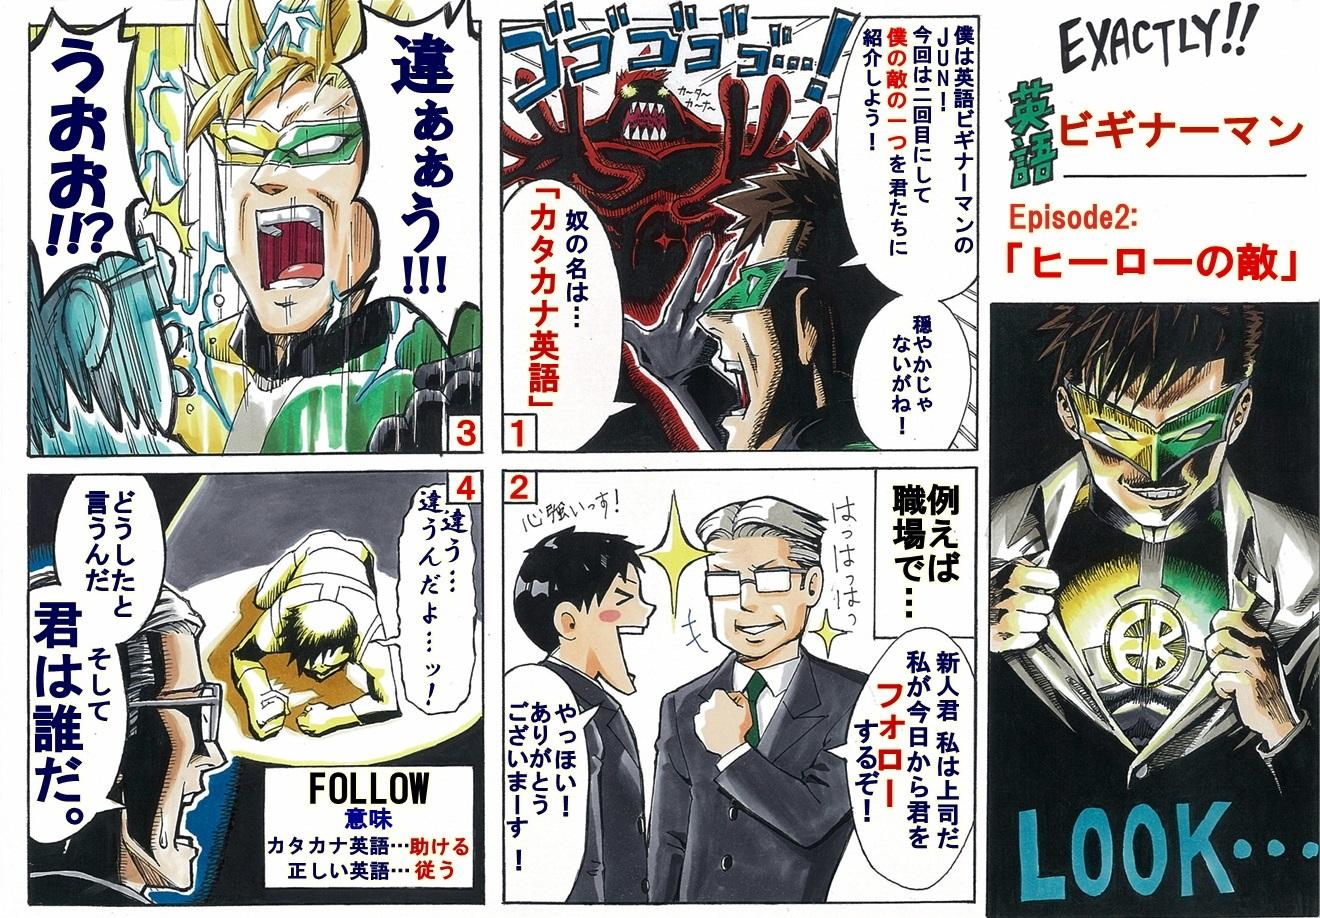 EXACTLY!!英語ビギナーマン第二話【ヒーローの敵】